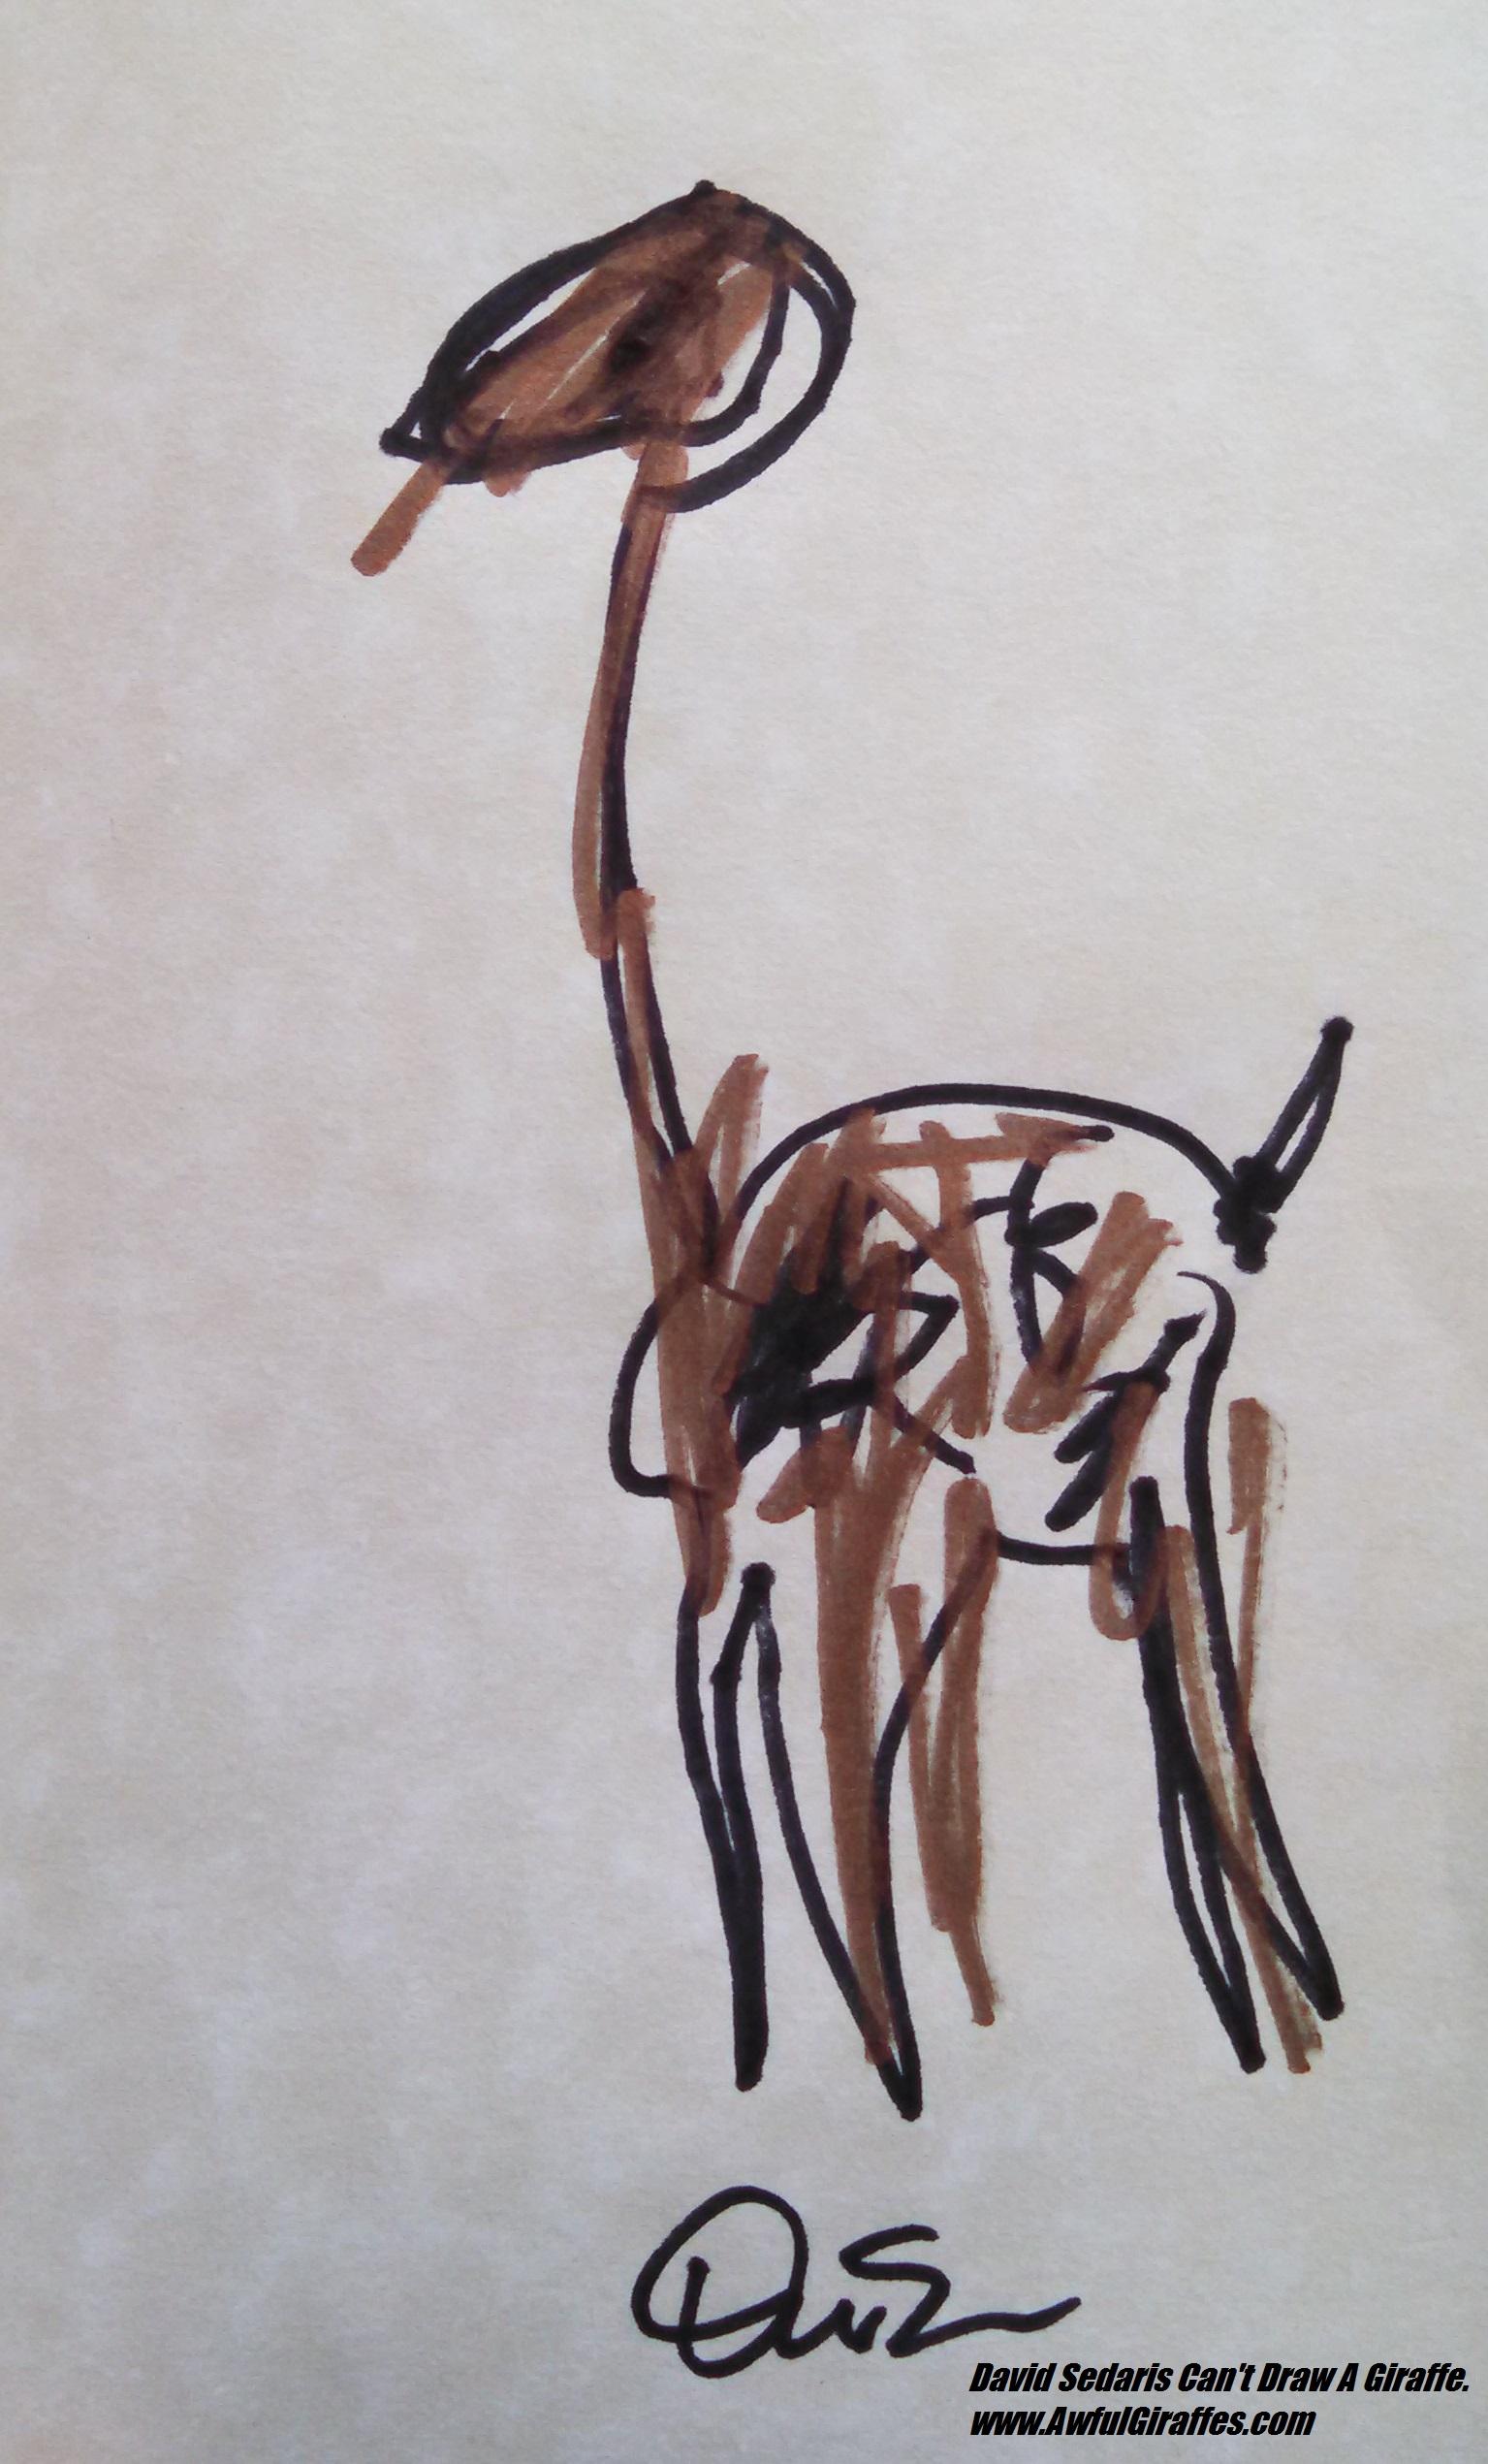 1535x2541 Drawing A Giraffe Is The Least Bizarre Thing David Sedaris' Done